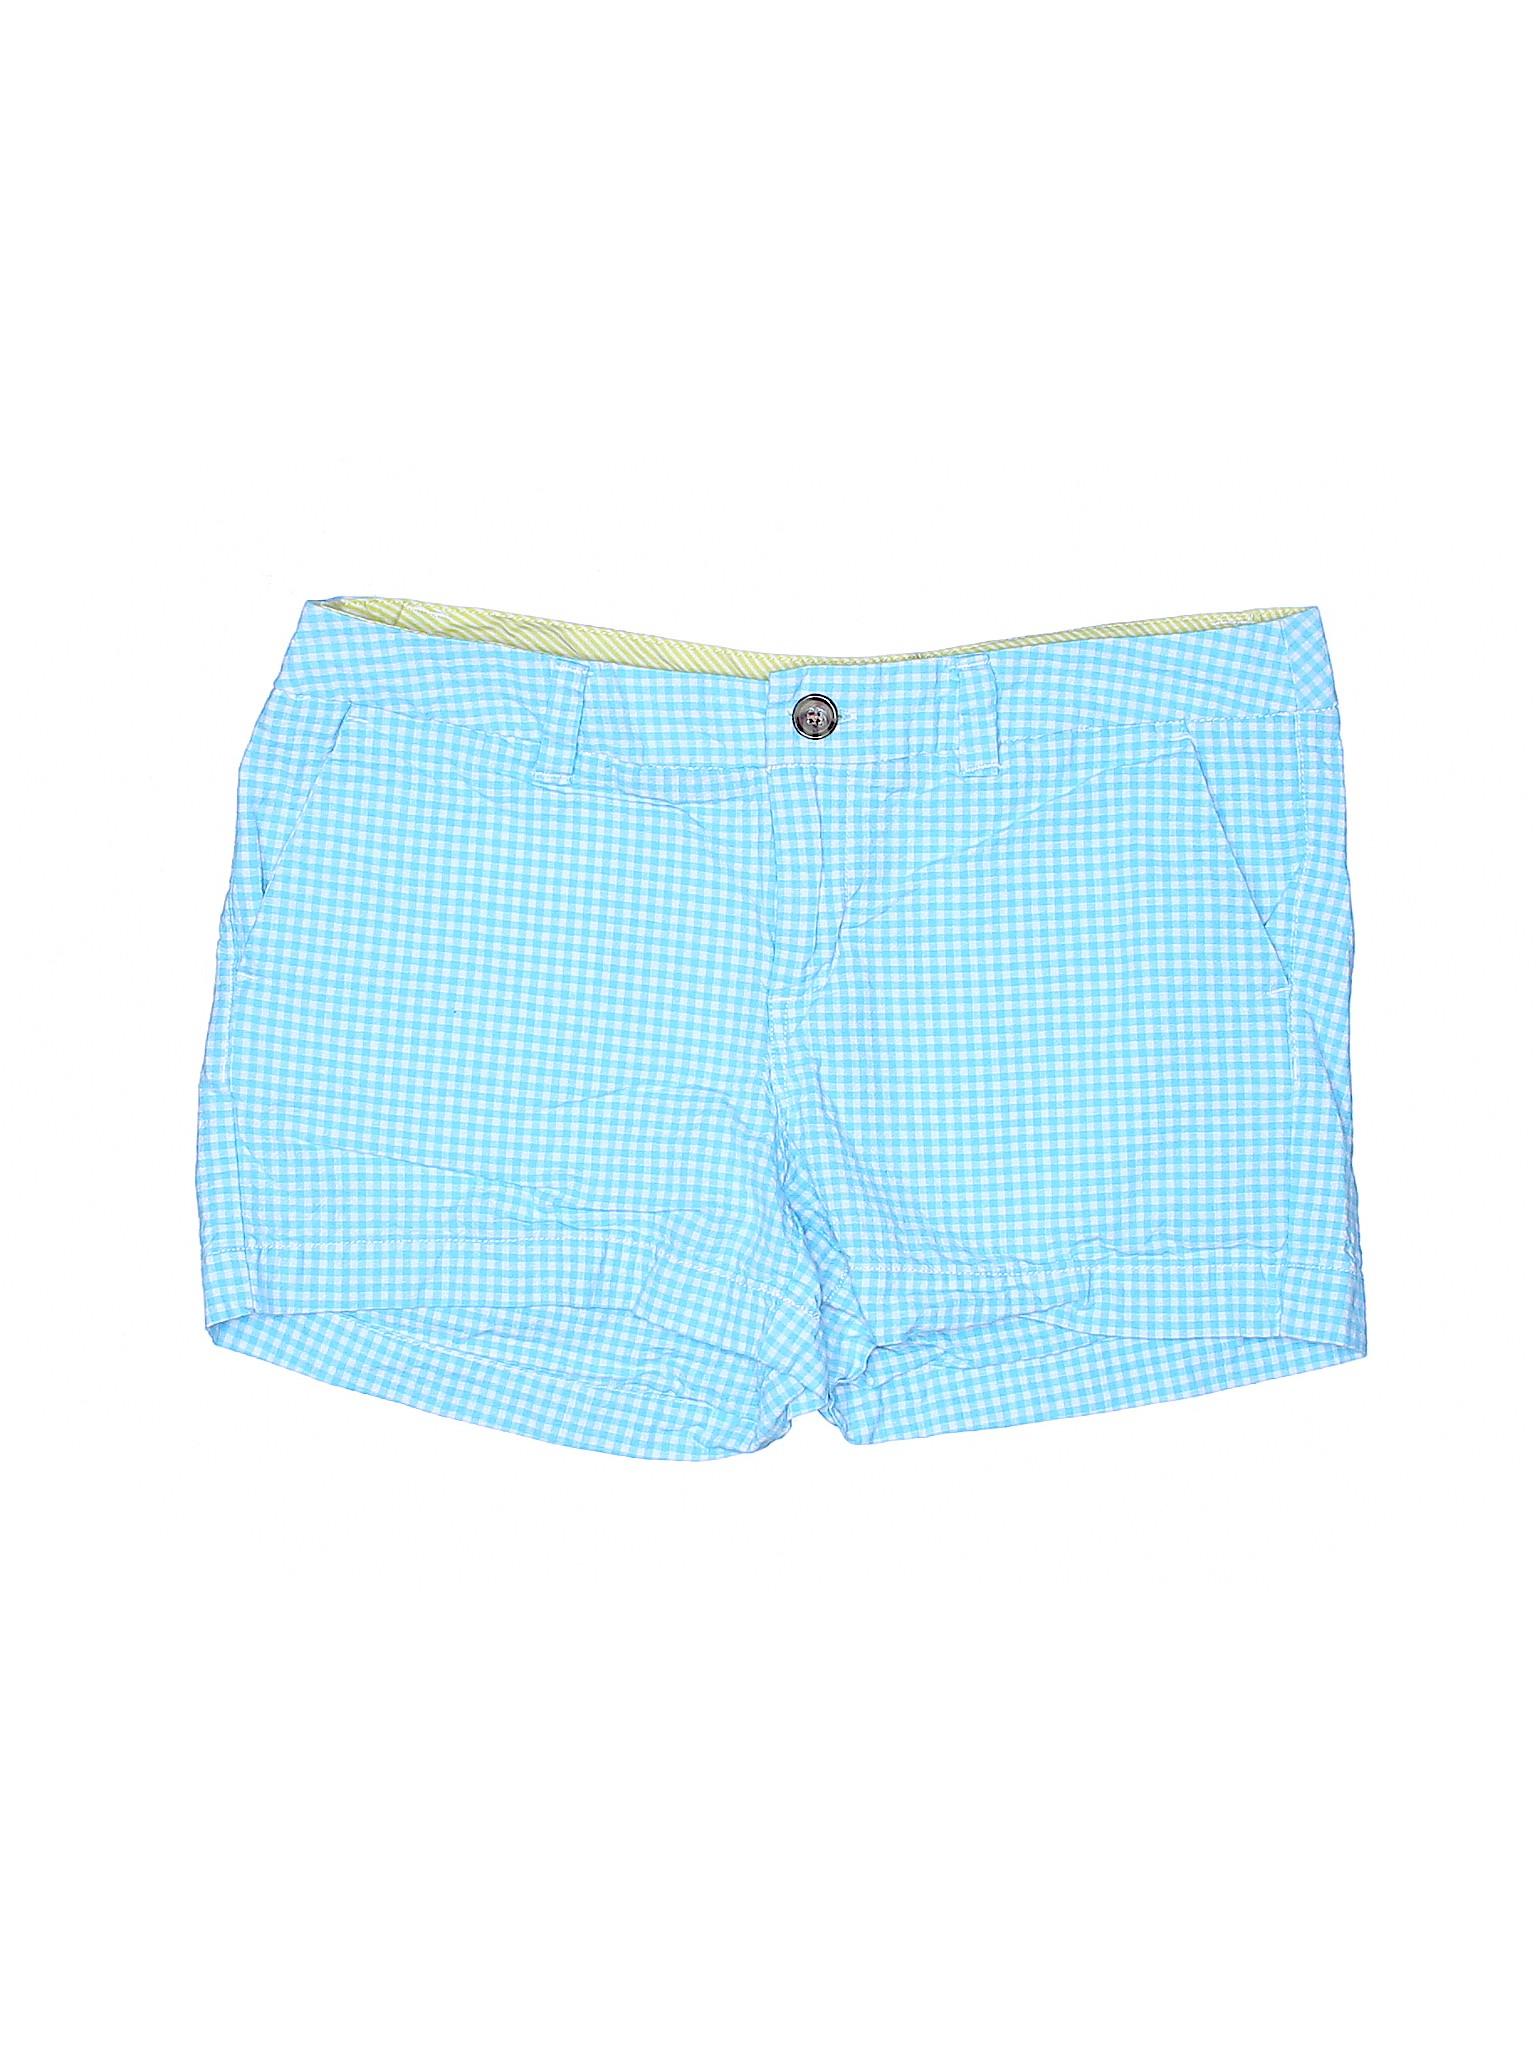 Shorts Merona Shorts Boutique Merona Khaki Boutique Khaki Boutique Merona Khaki 0fddqHnw